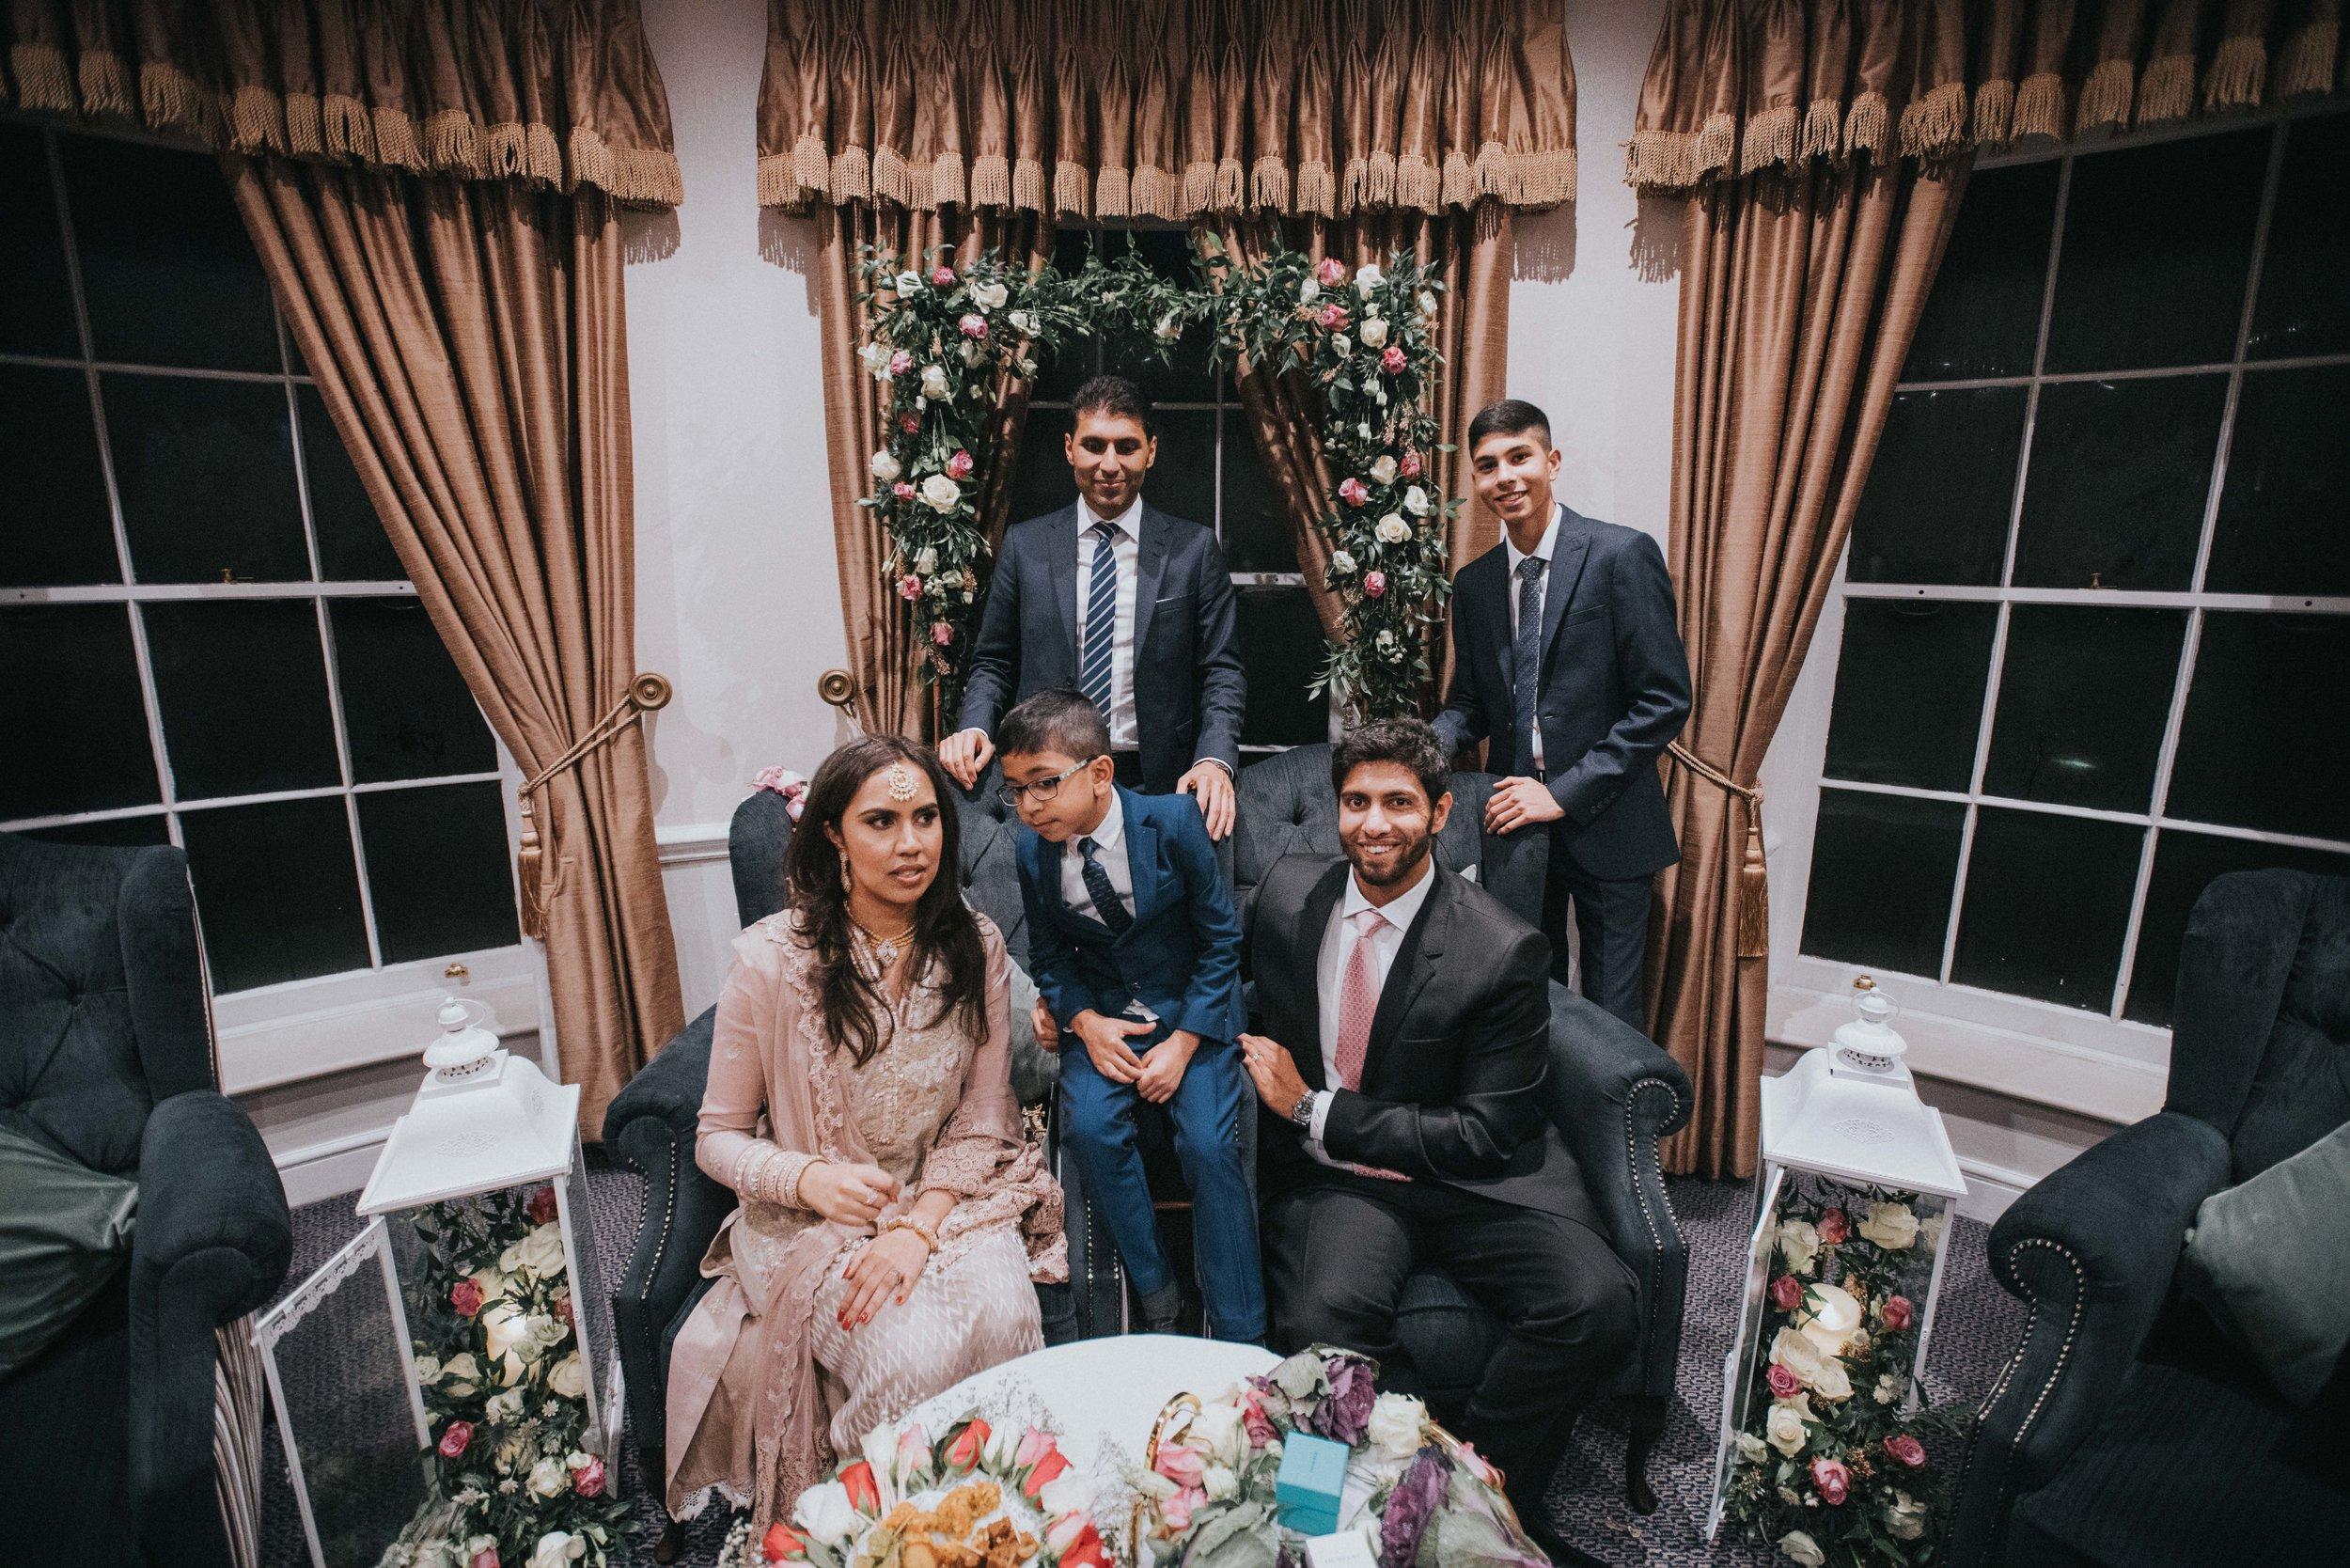 buckinghamshire-golf-club-winter-muslim-wedding-engagement-photography-videography-38